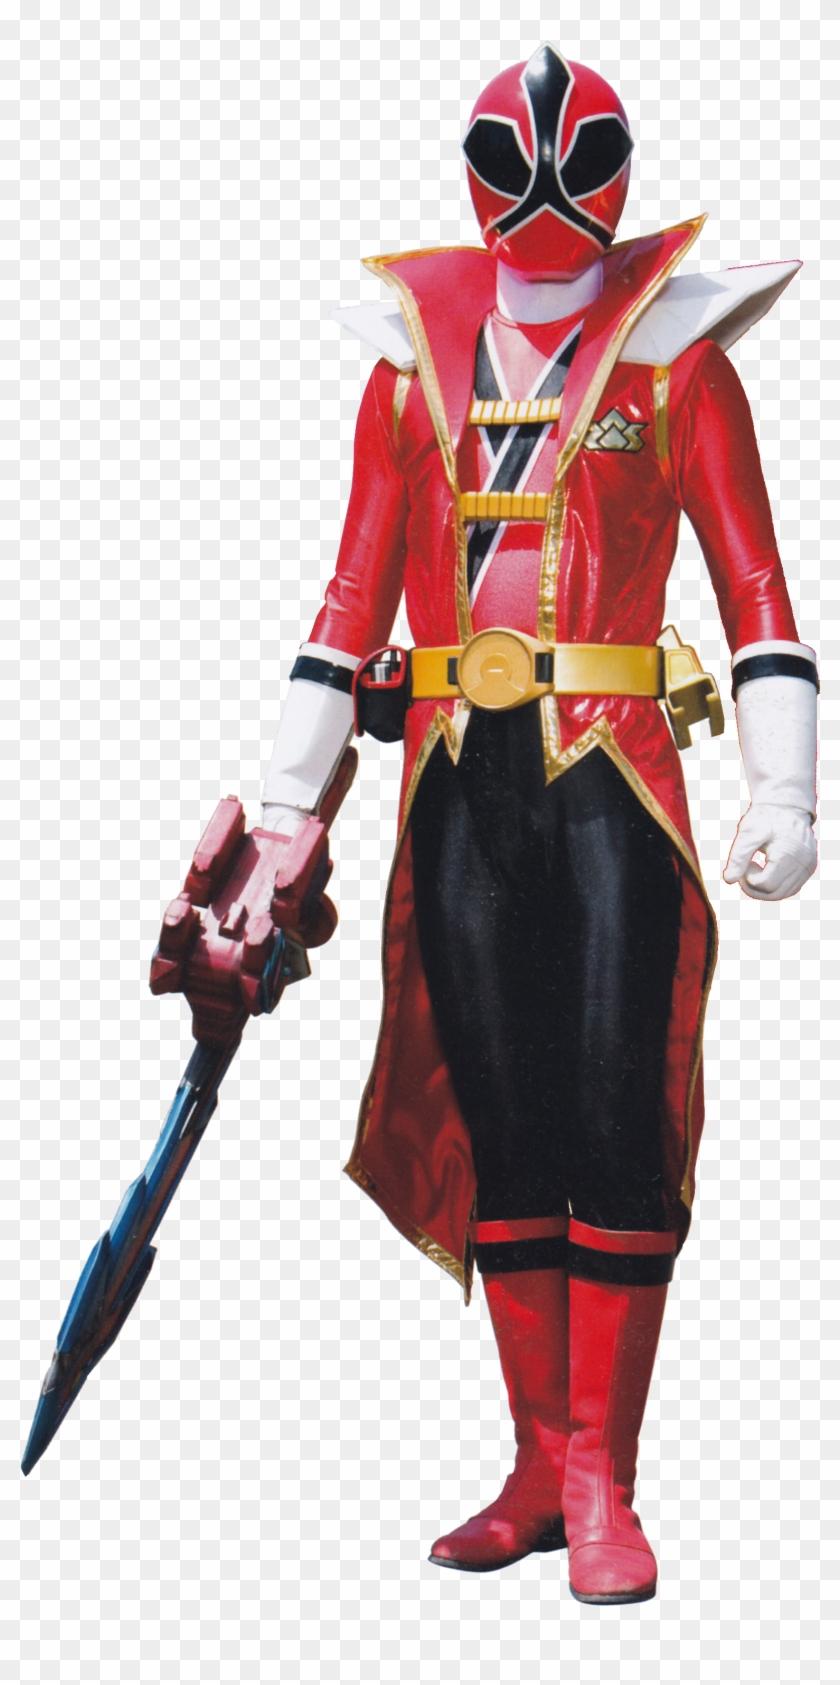 Power Rangers Samurai Coloring Pages - GetColoringPages.com | 1685x840